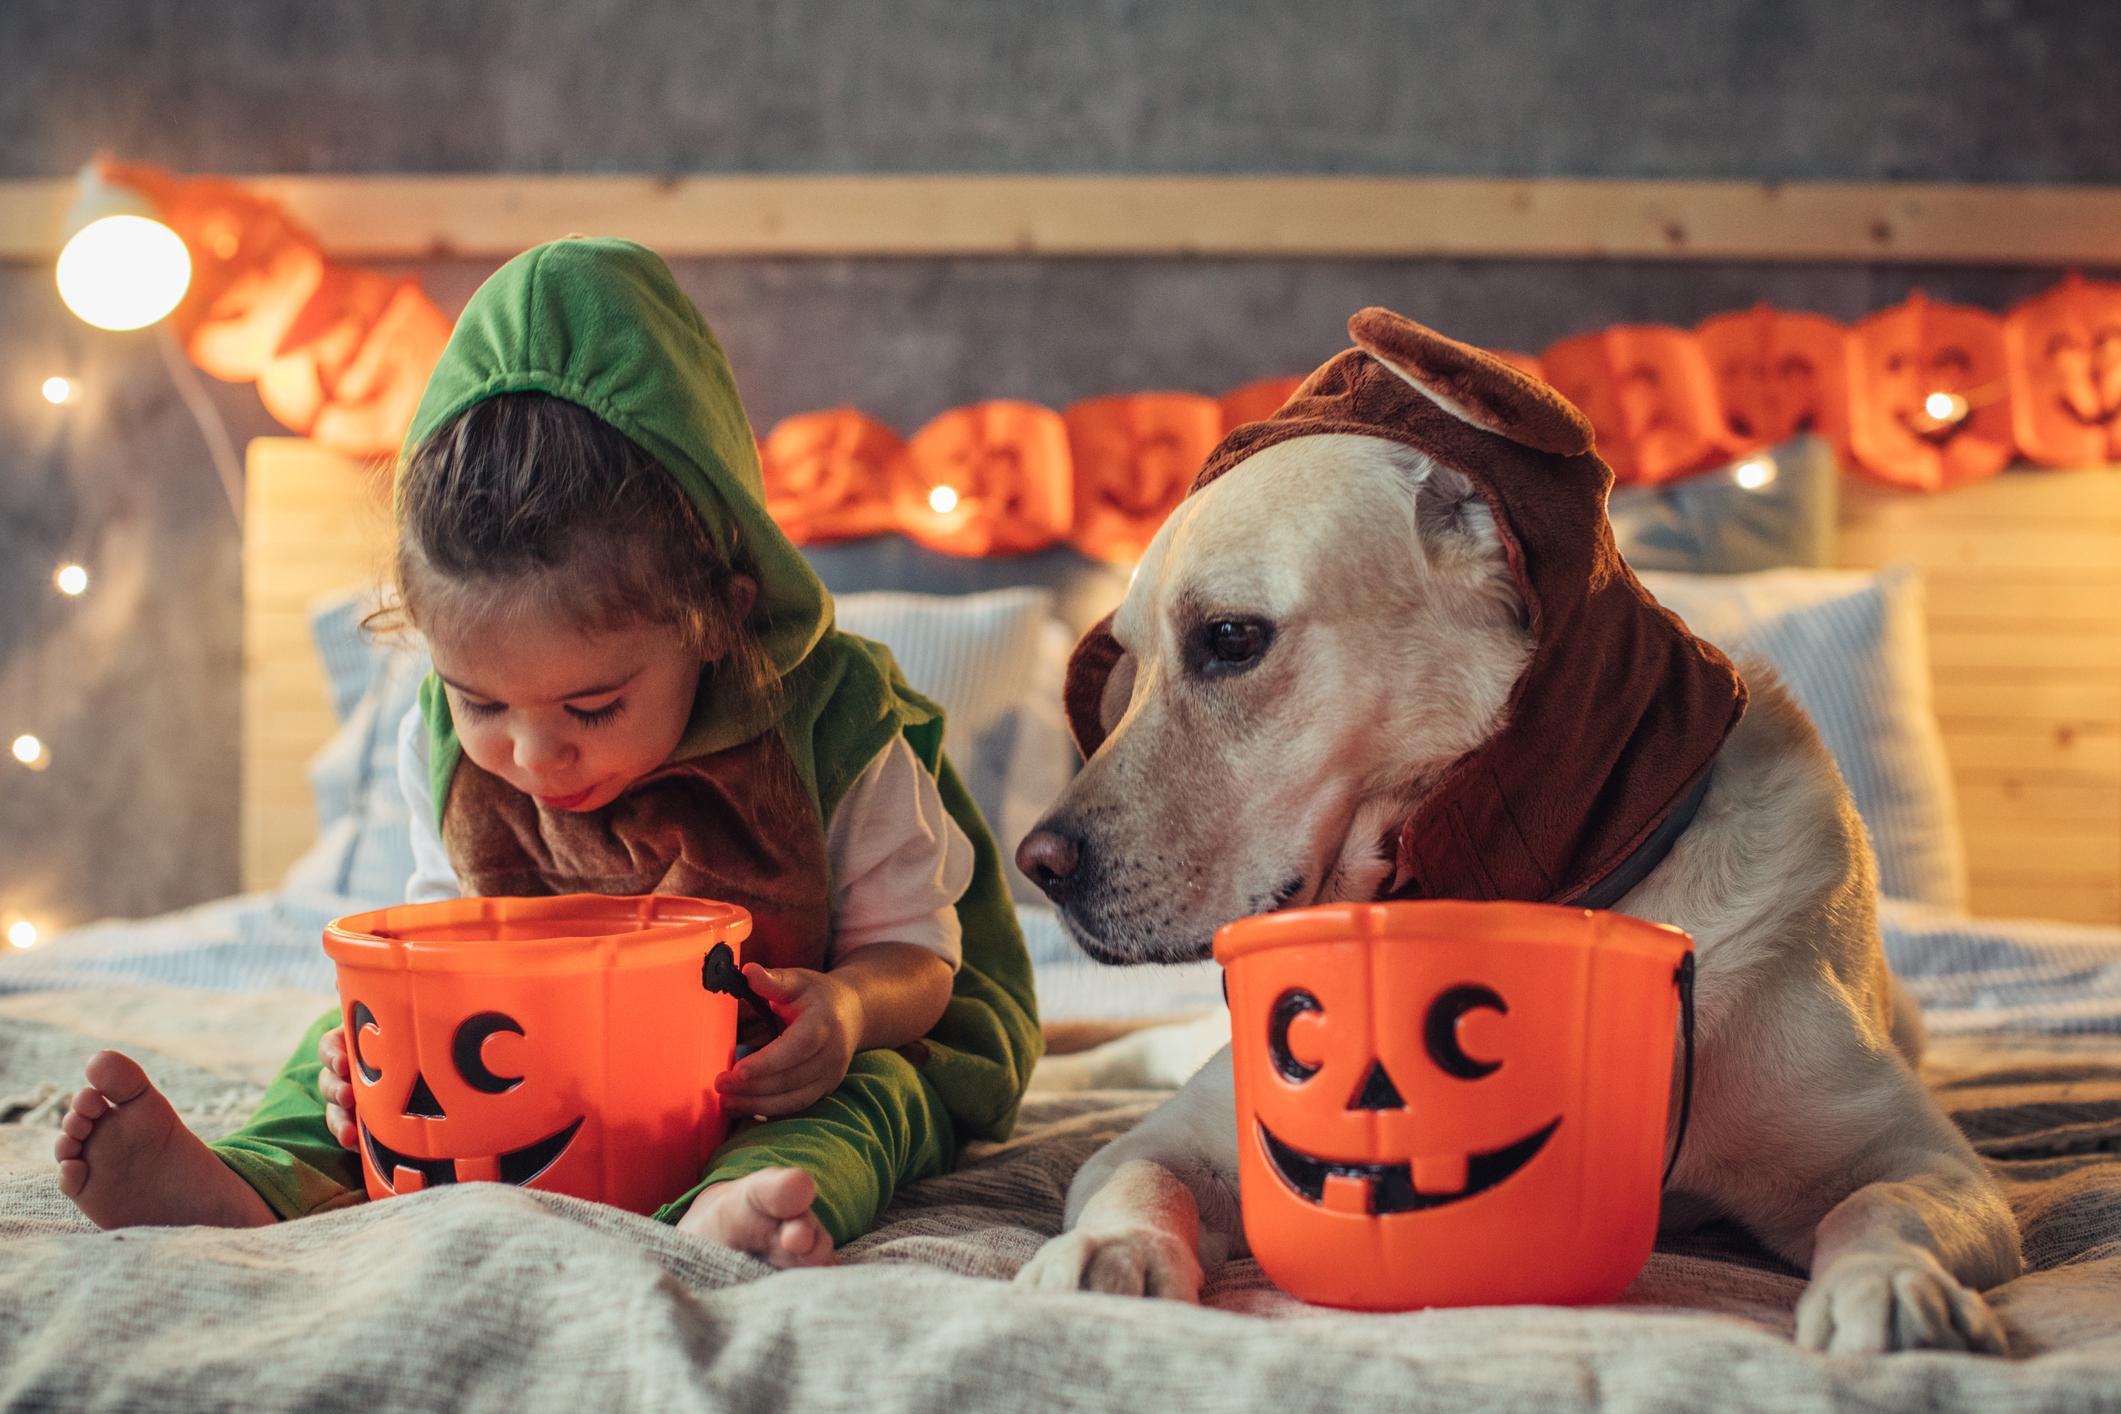 Vegan Halloween – 4 ways to enjoy the celebration with your family